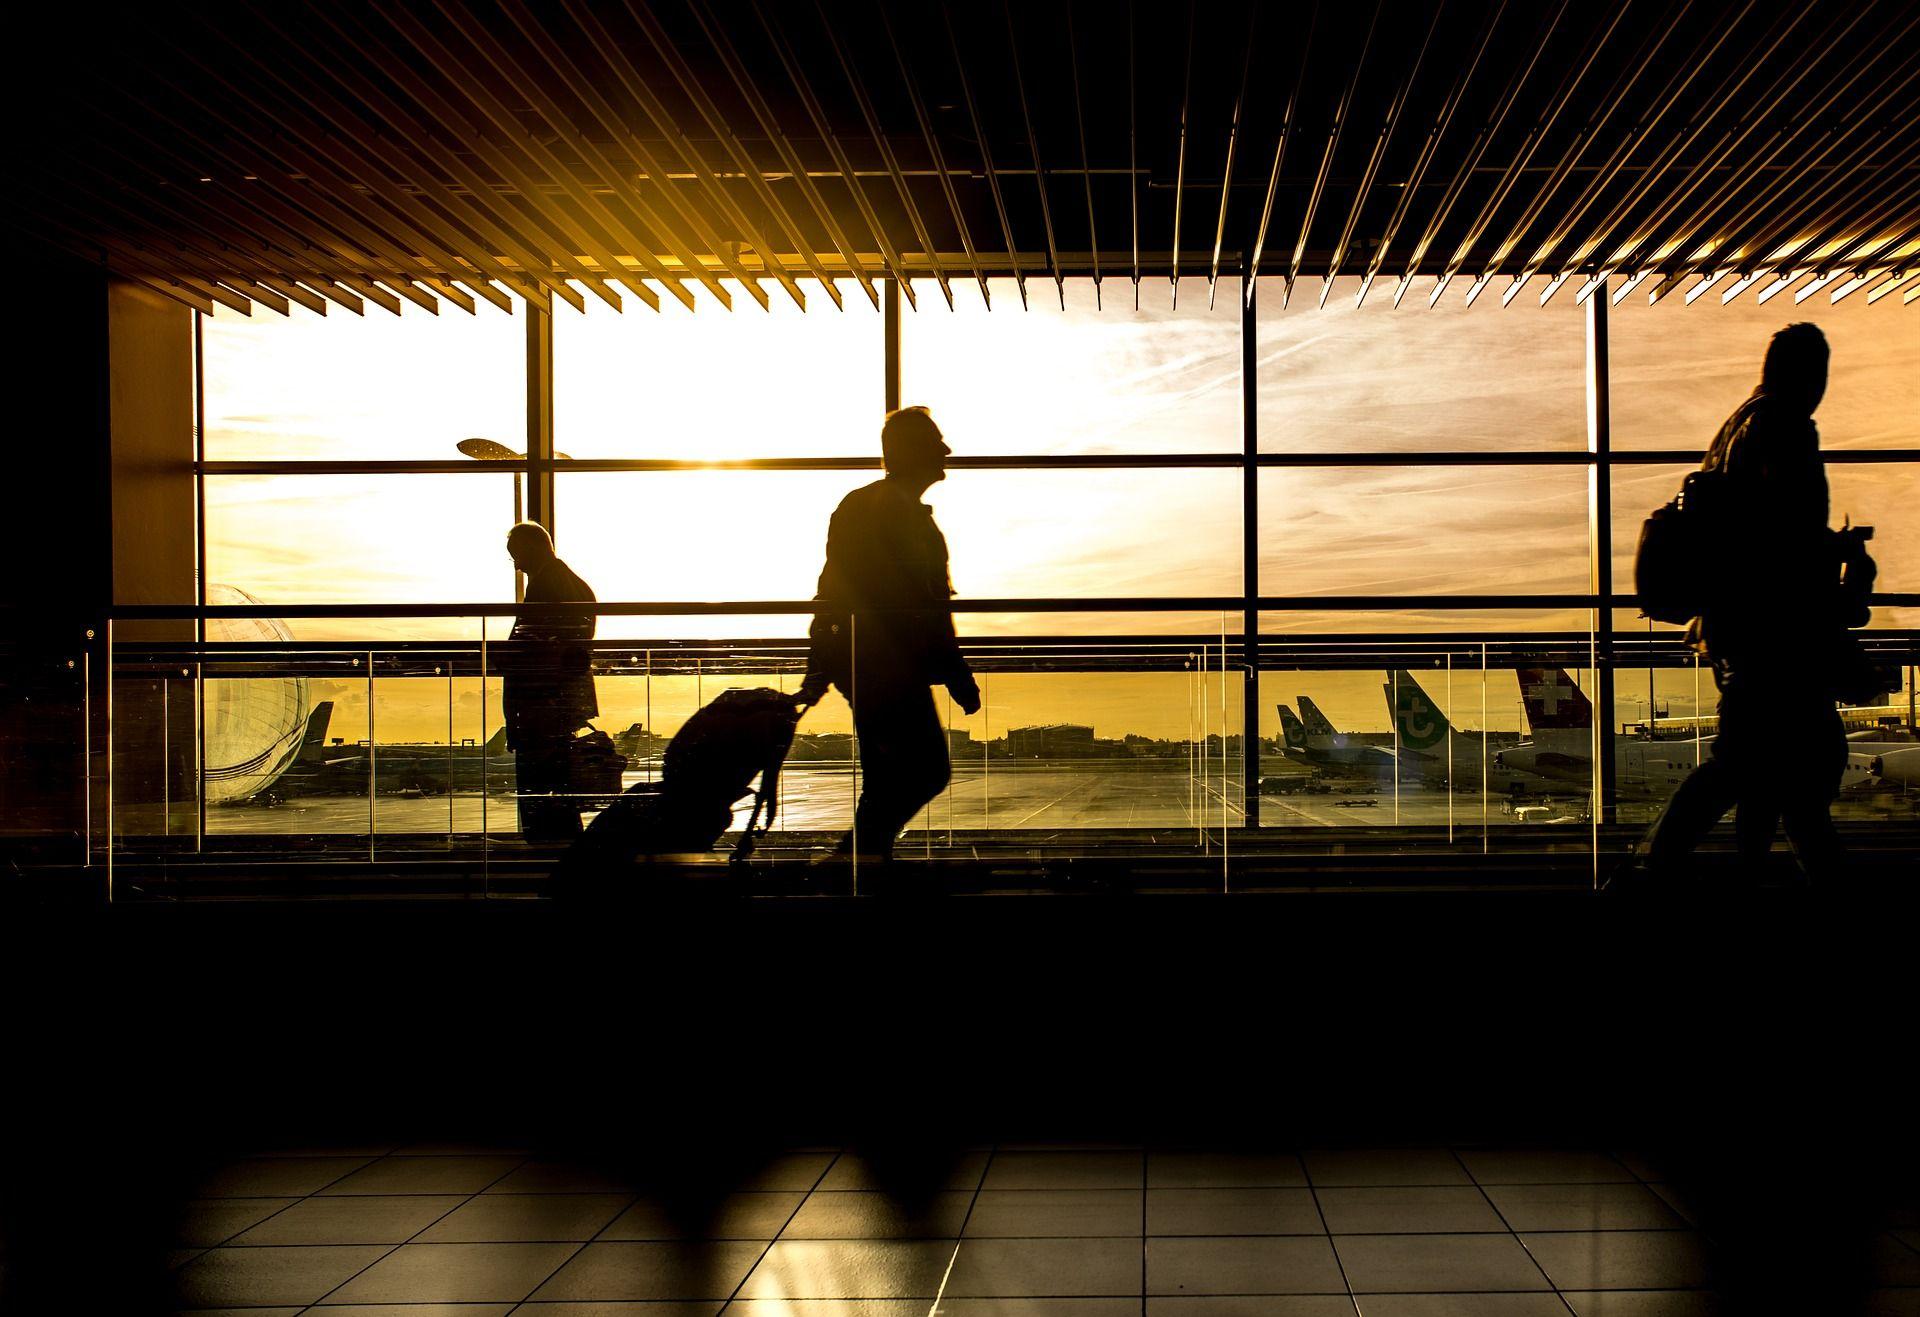 pessoas transitando no aeroporto